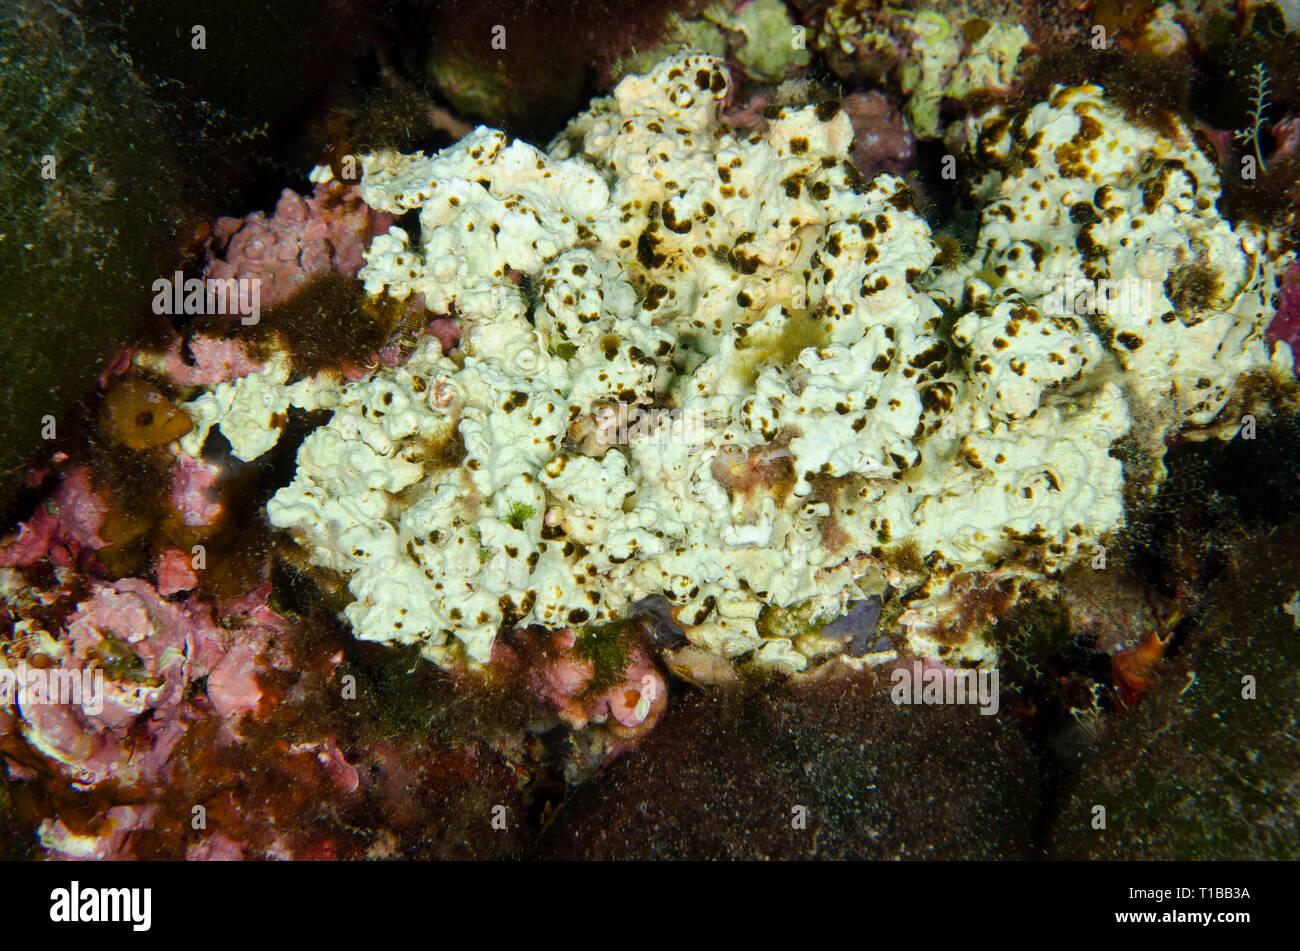 Demospongiae, Ircina variabilis, Irciniida,  Tor Paterno Marine Protected Area, Rome, Italy, Mediterranean Sea - Stock Image